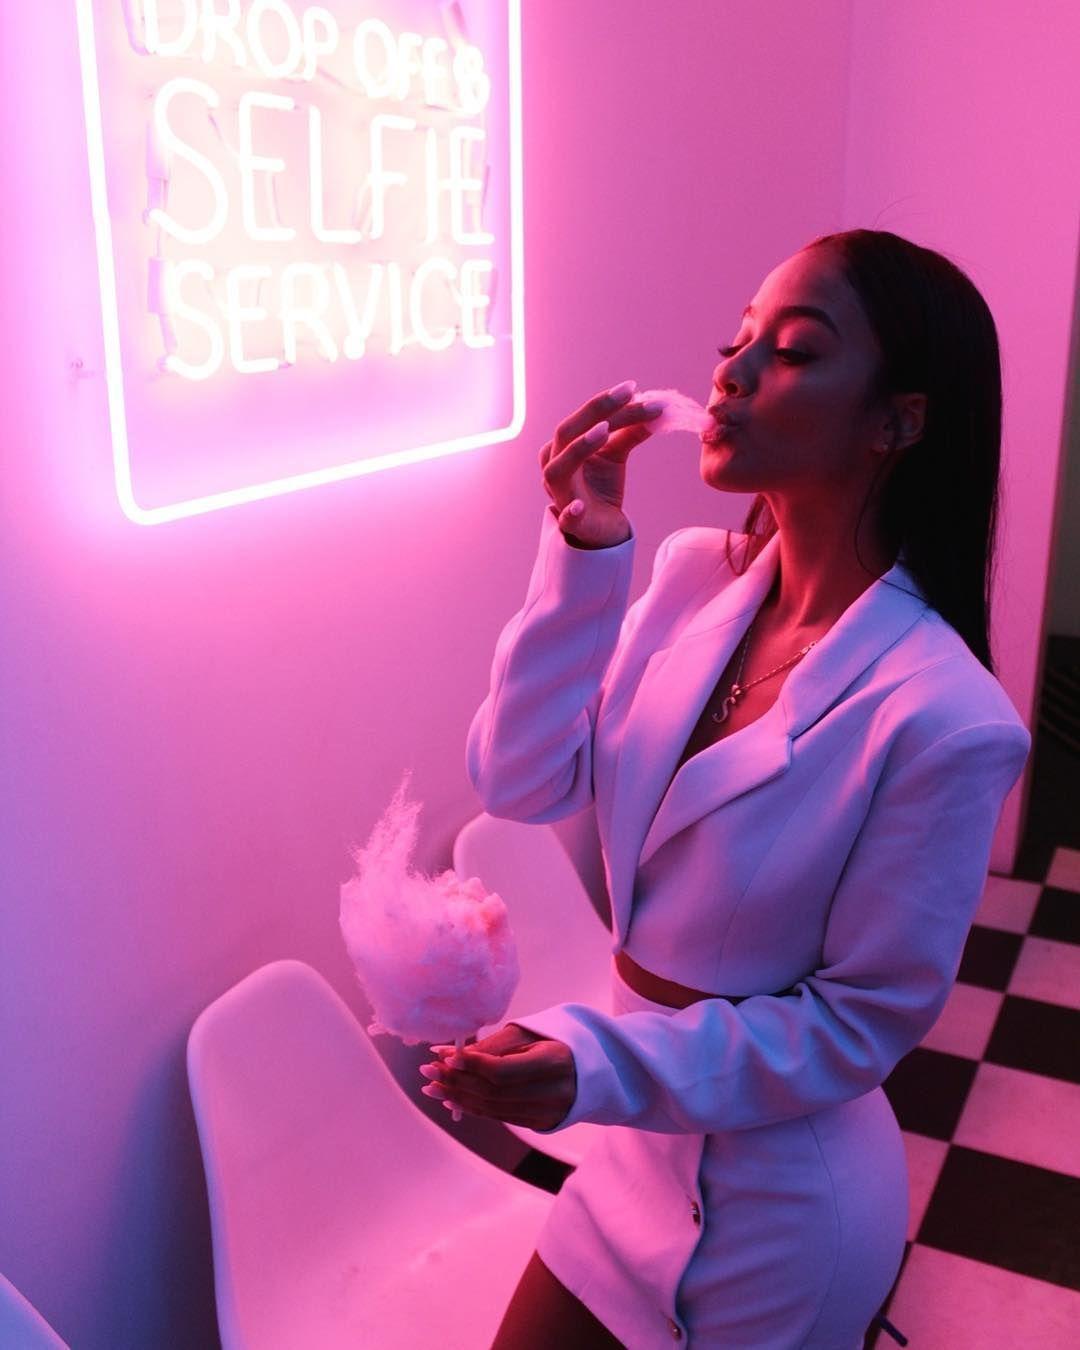 Https Www Instagram Com P Bhxmffpn3ii Taken By Sel Xo Pastel Pink Aesthetic Bad Girl Aesthetic Neon Aesthetic Pink baddie neon sign neon signs pink neon sign neon quotes. pastel pink aesthetic bad girl